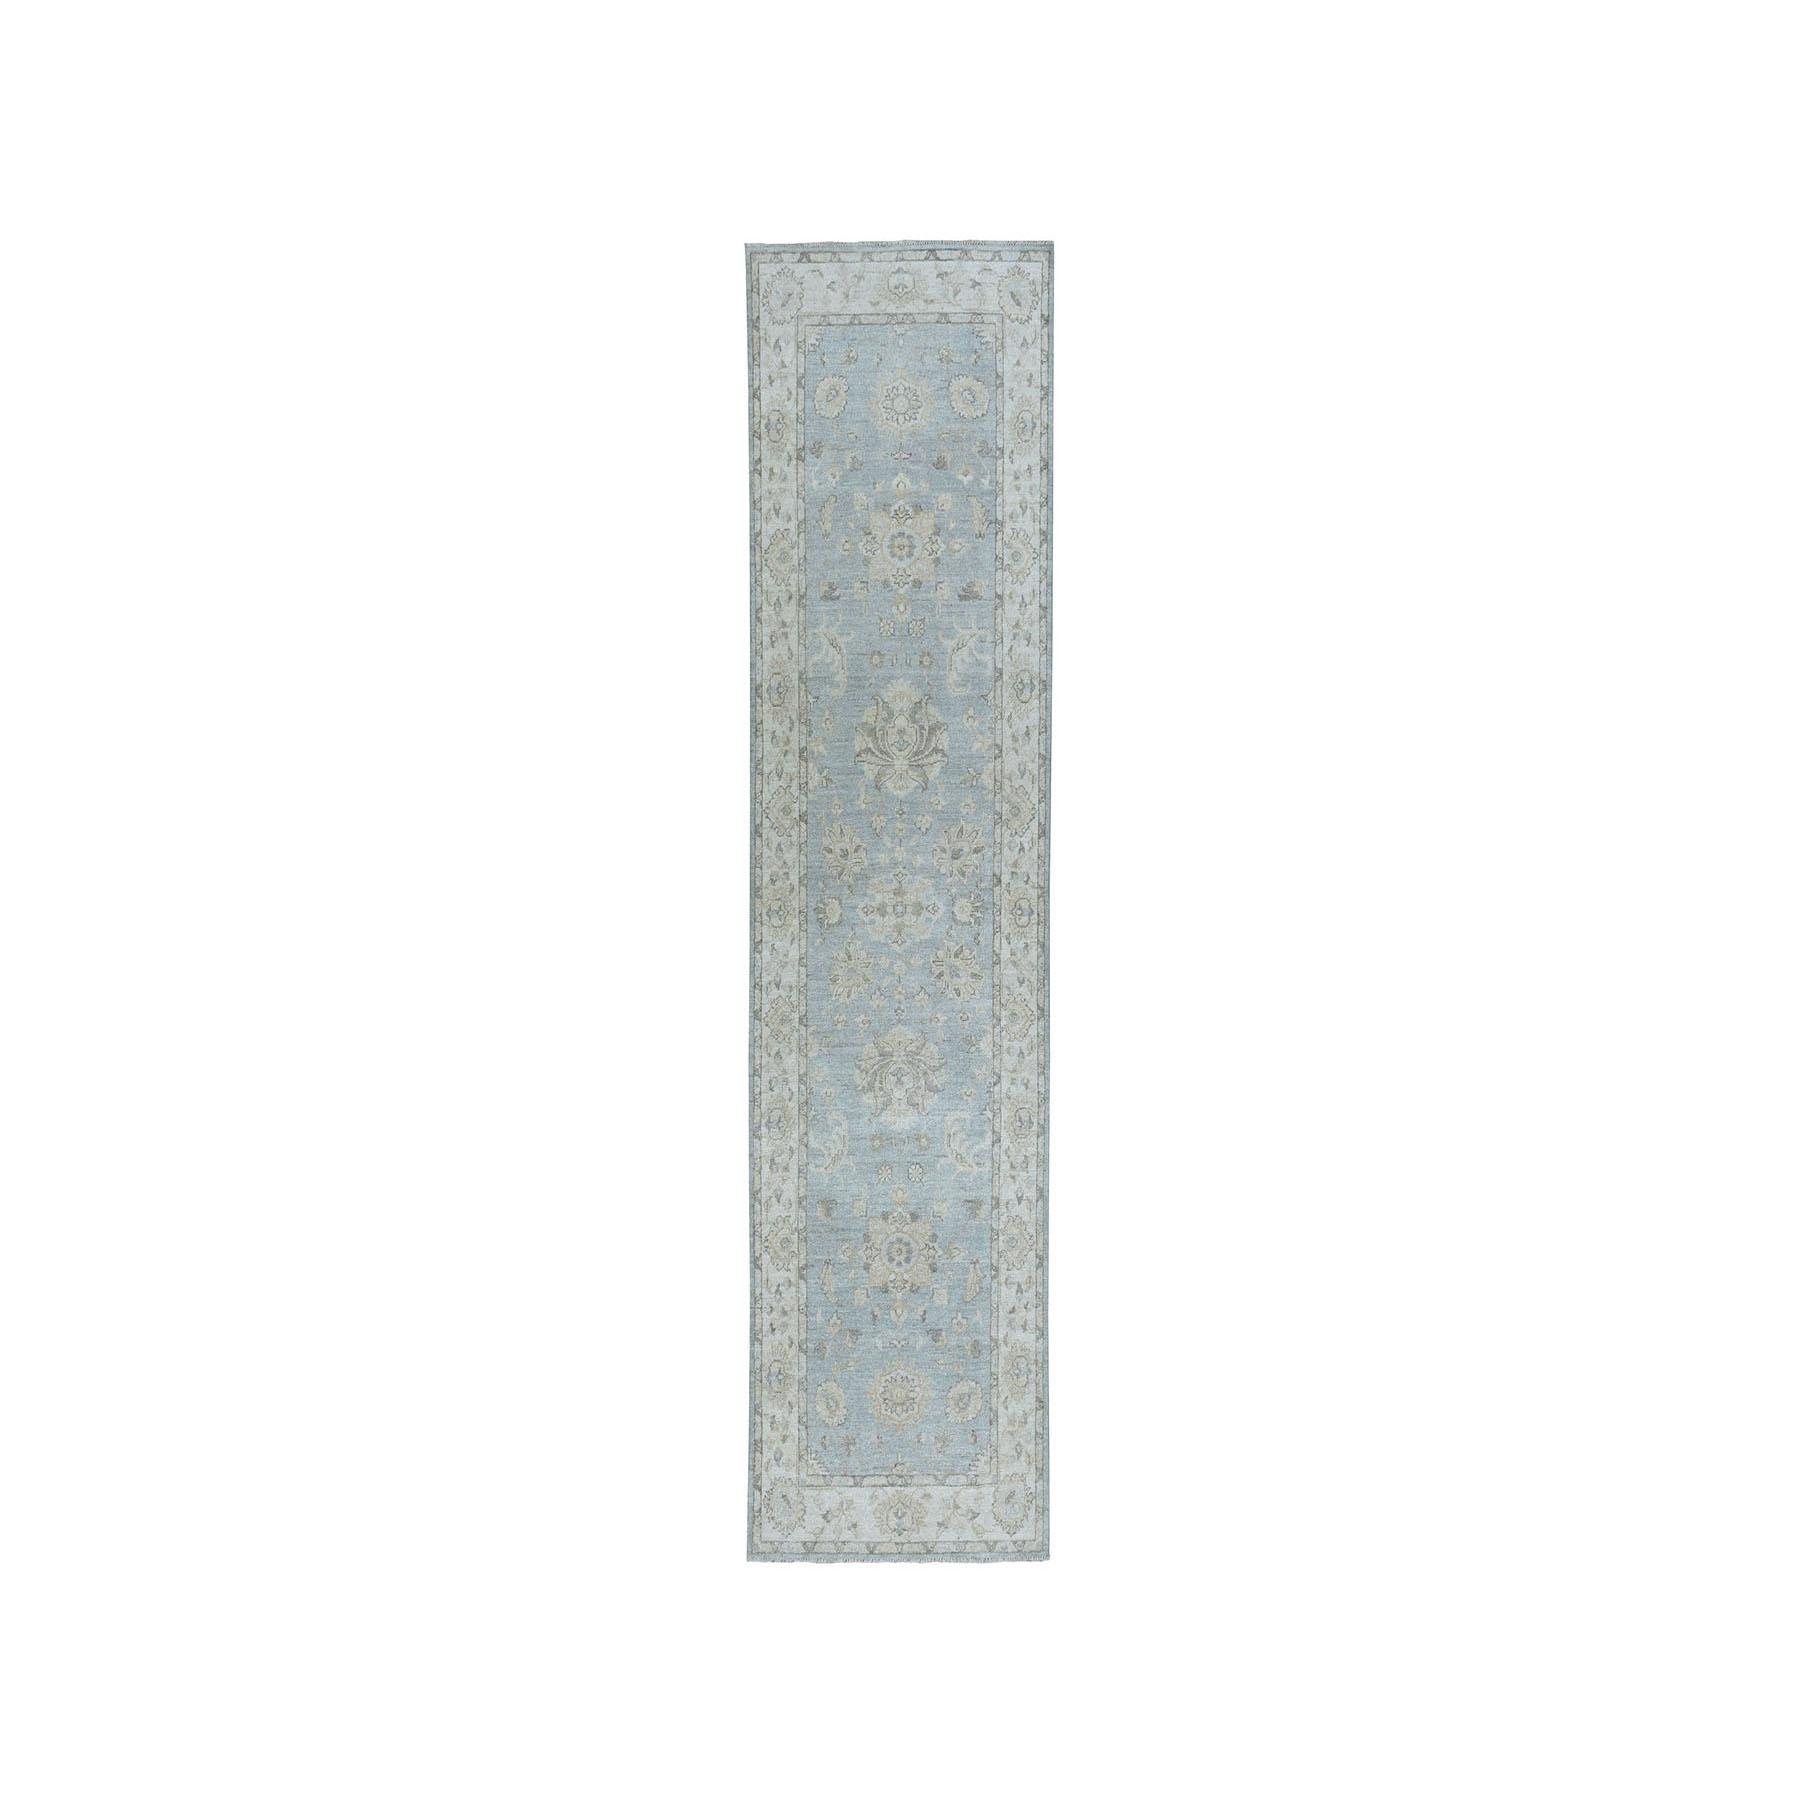 "3'X10'1"" White Wash Peshawar Pure Wool Hand-Knotted Runner Oriental Rug moaea09c"